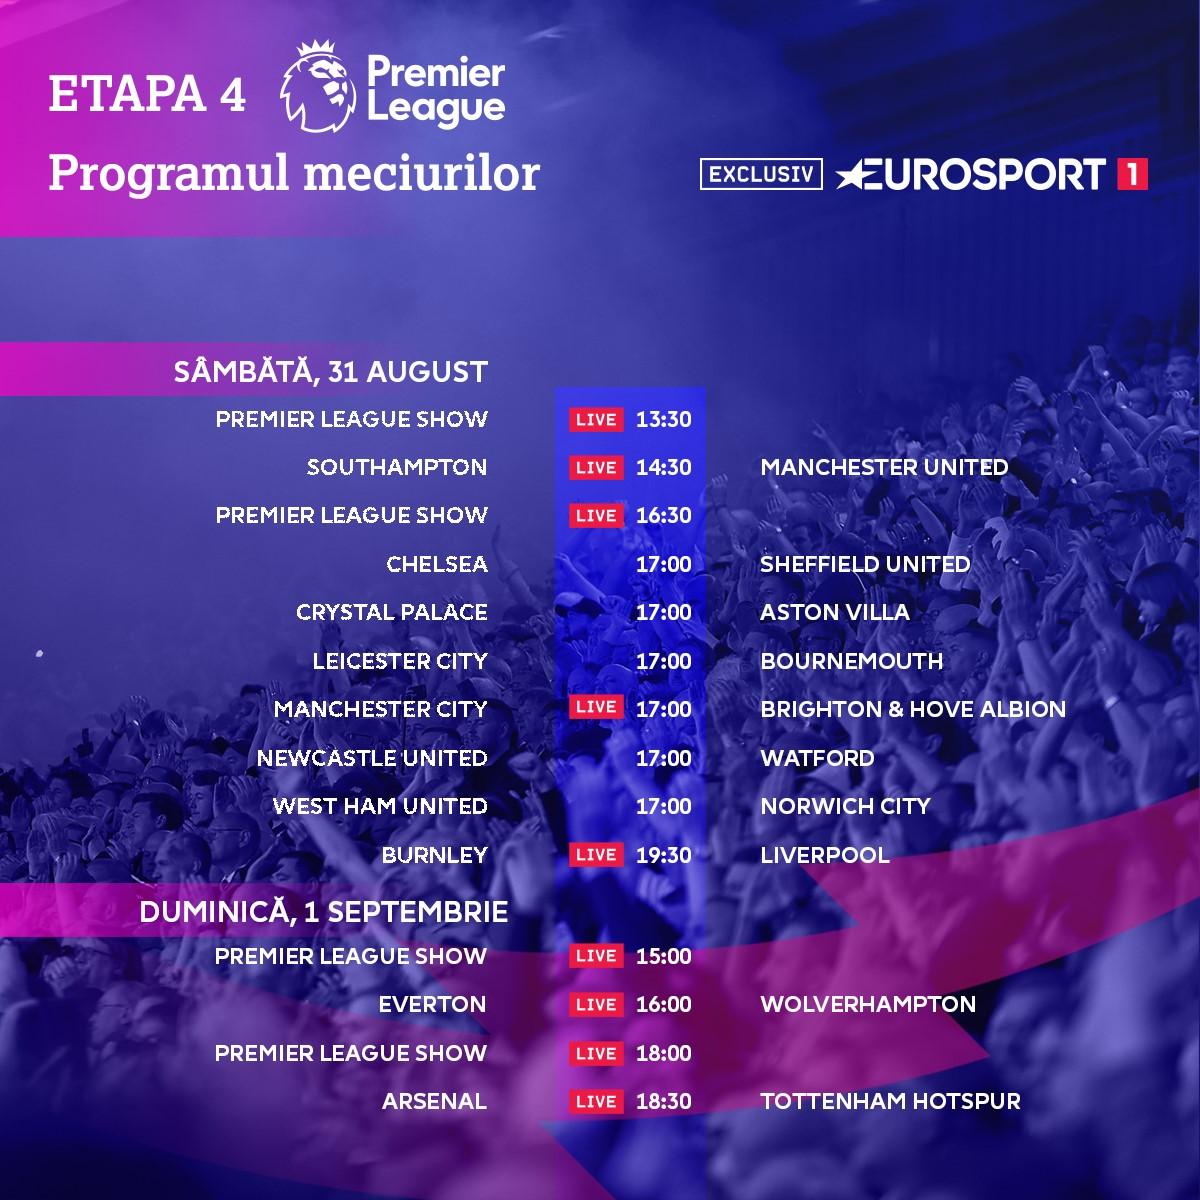 Premier League 2019-2020: Matchday 4 schedule